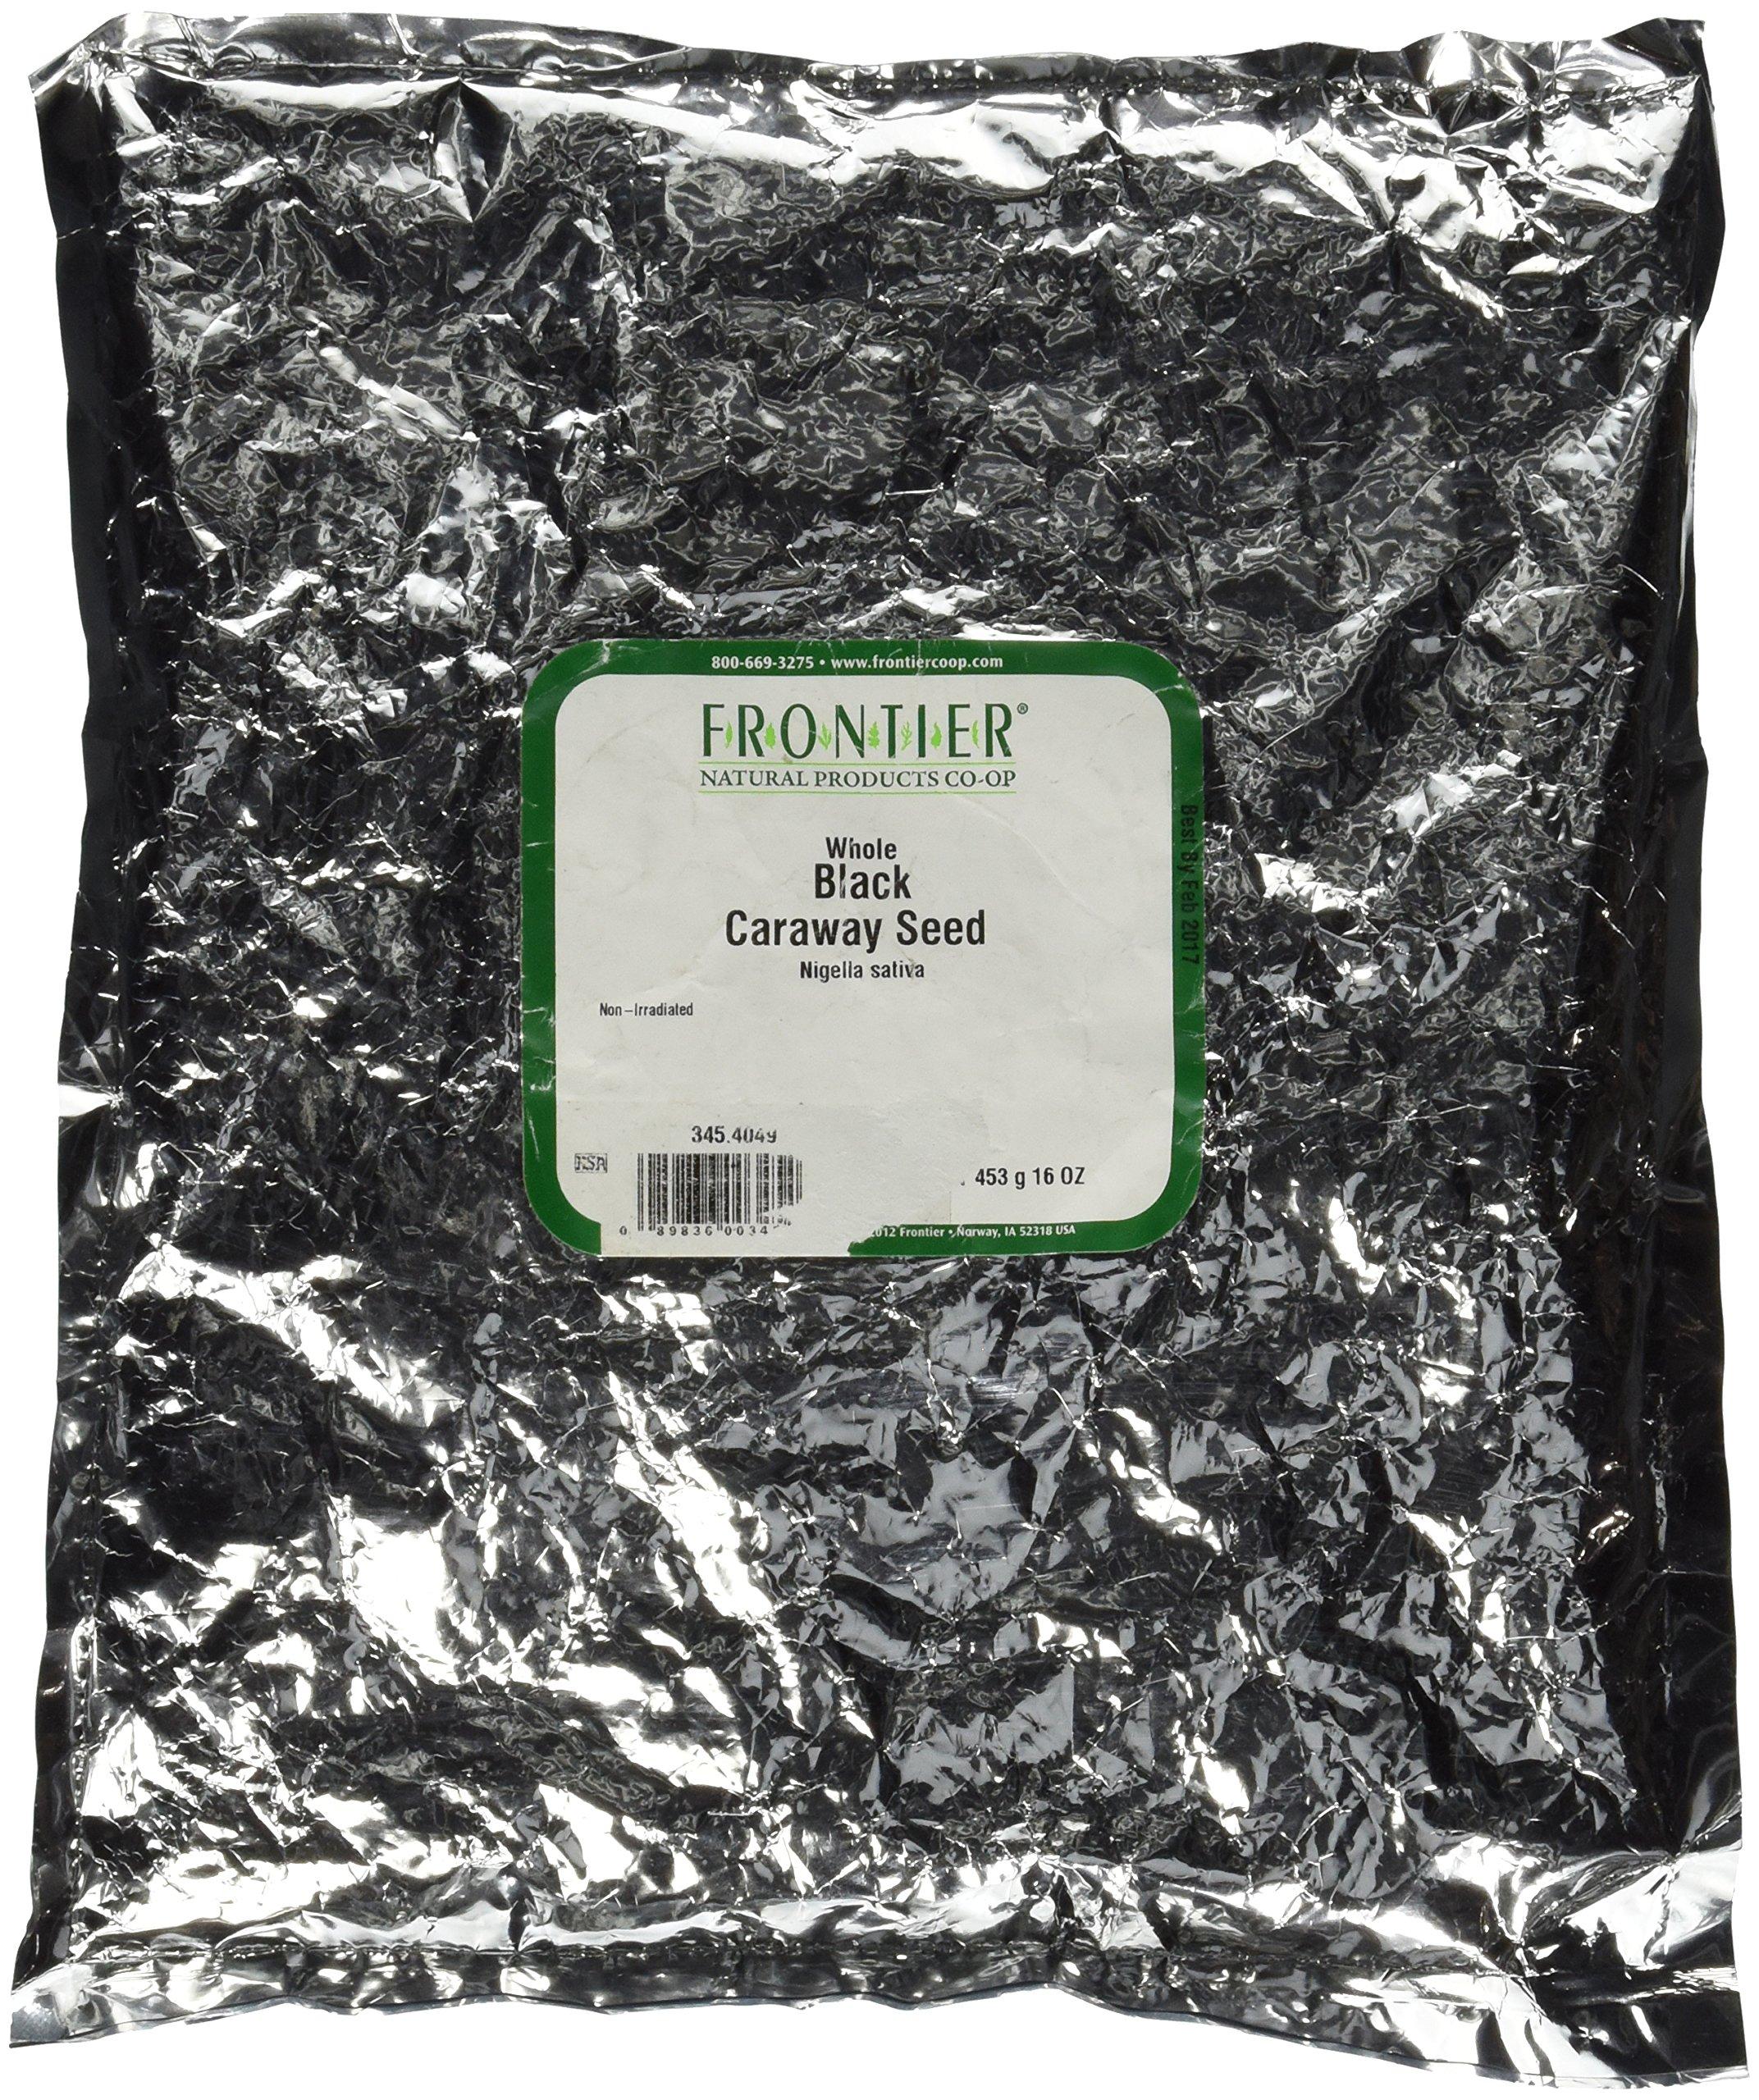 Frontier Bulk Caraway Seed Black, 1 lb. package